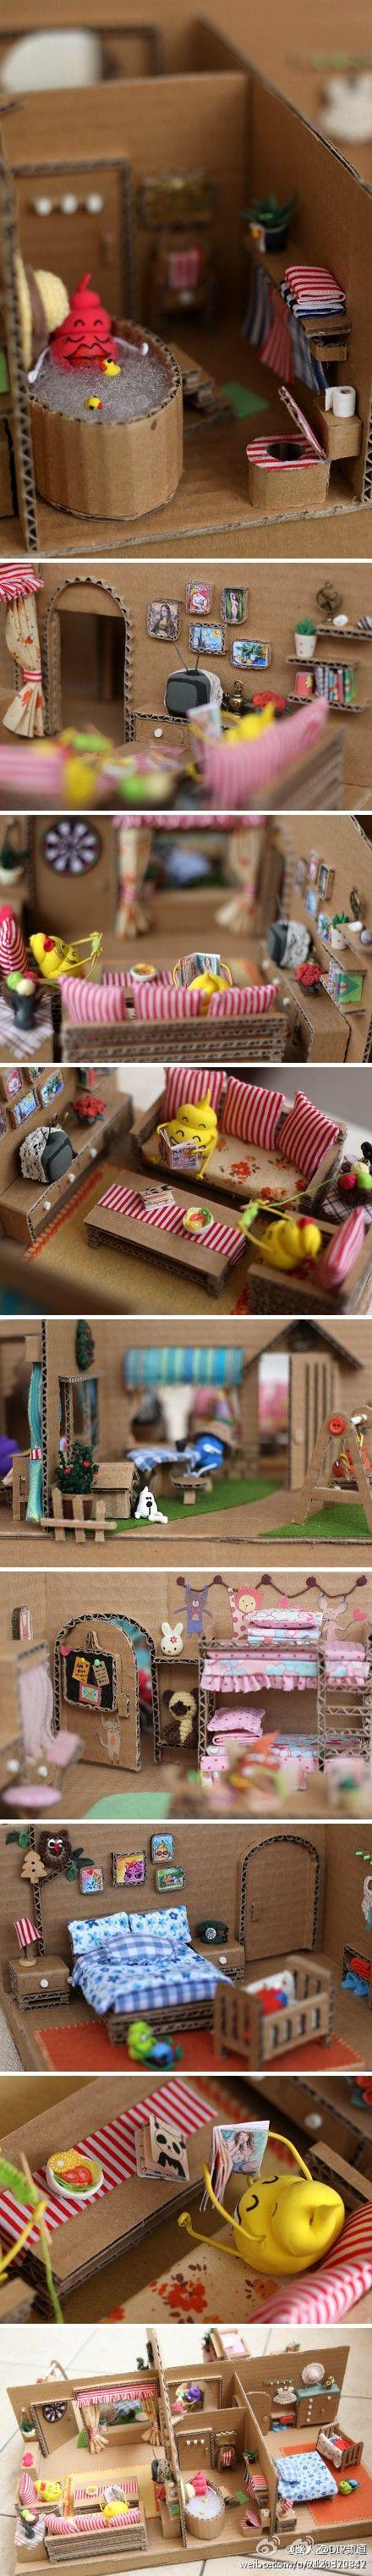 cardboard doll house!